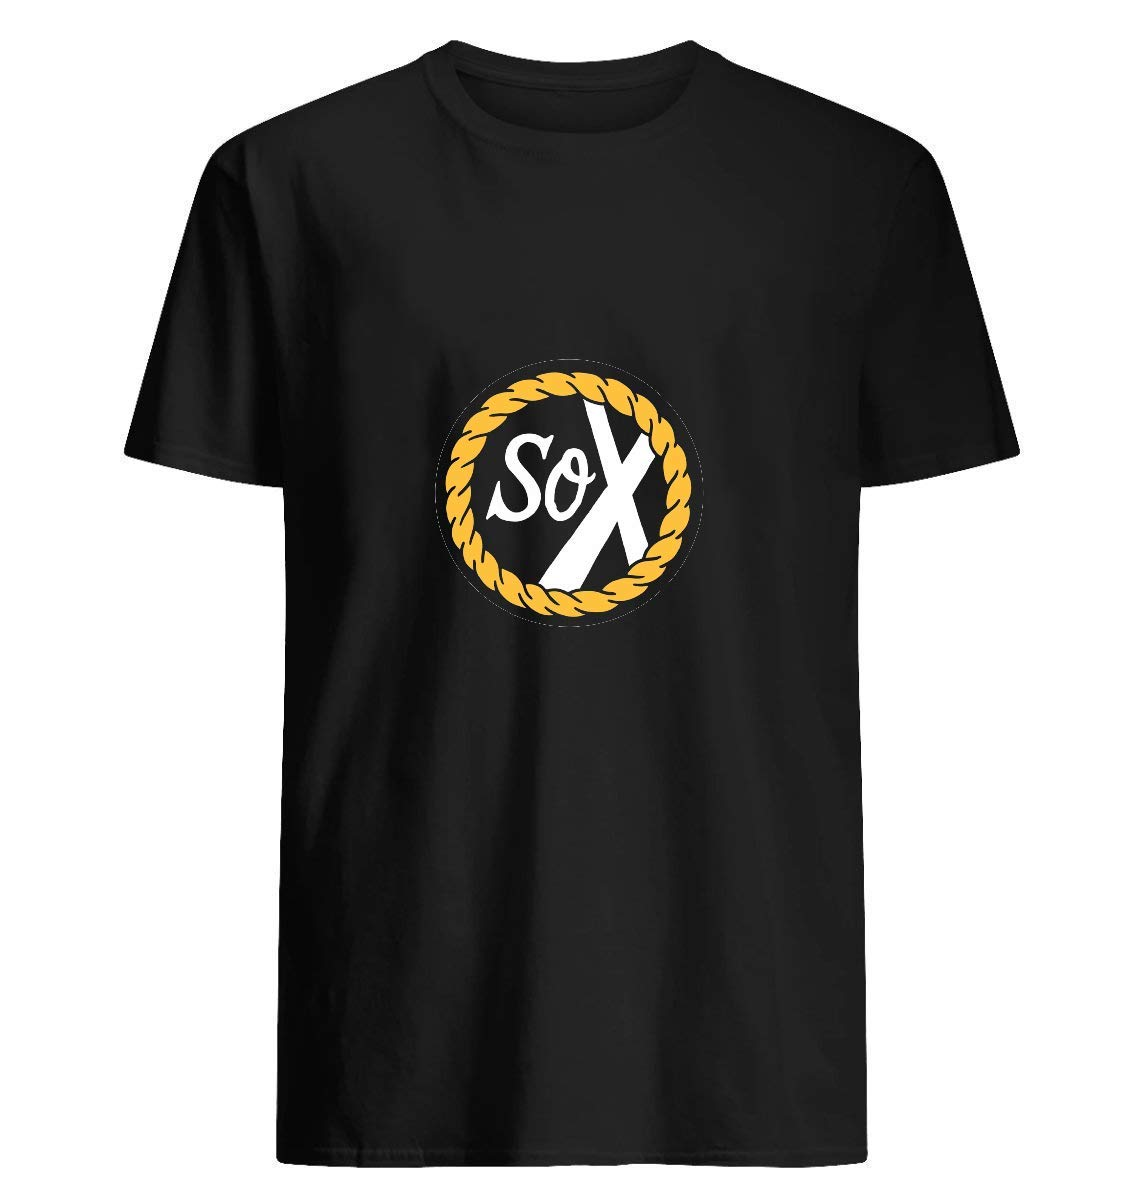 Sox High Low Hem Tshirt Basic And Stylish Out